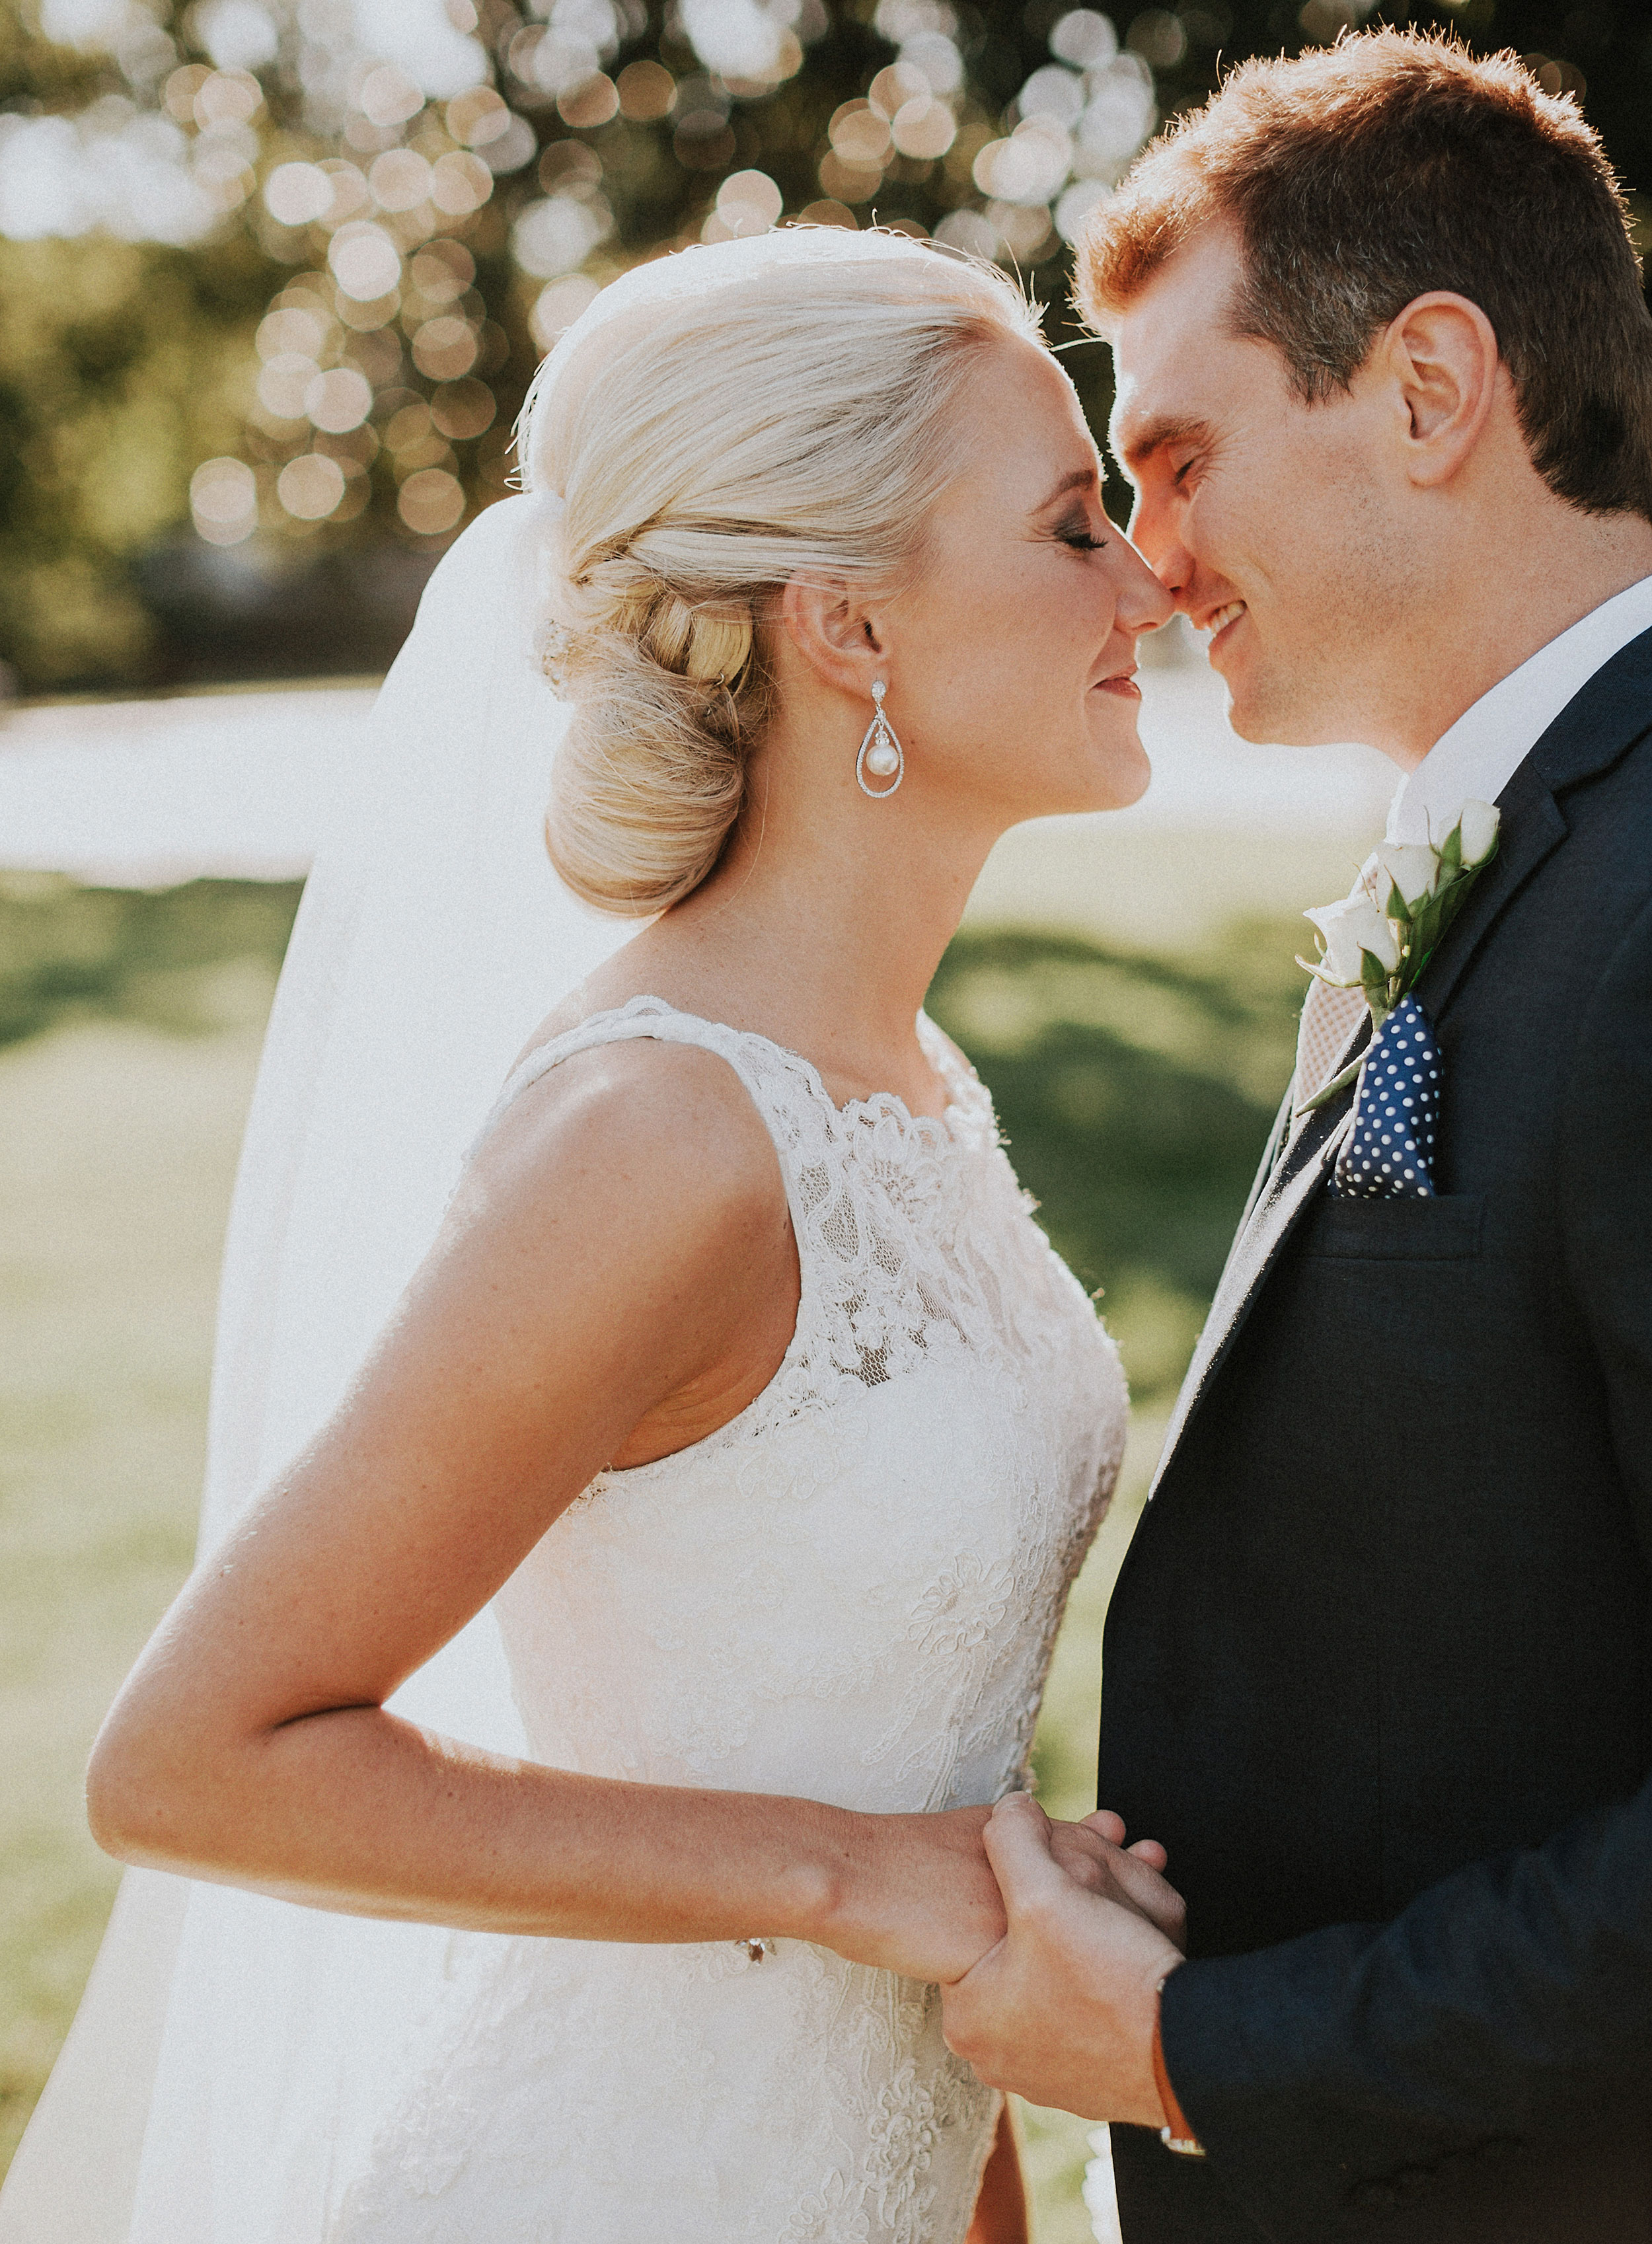 olmsted-wedding-louisville-kentucky-037.JPG